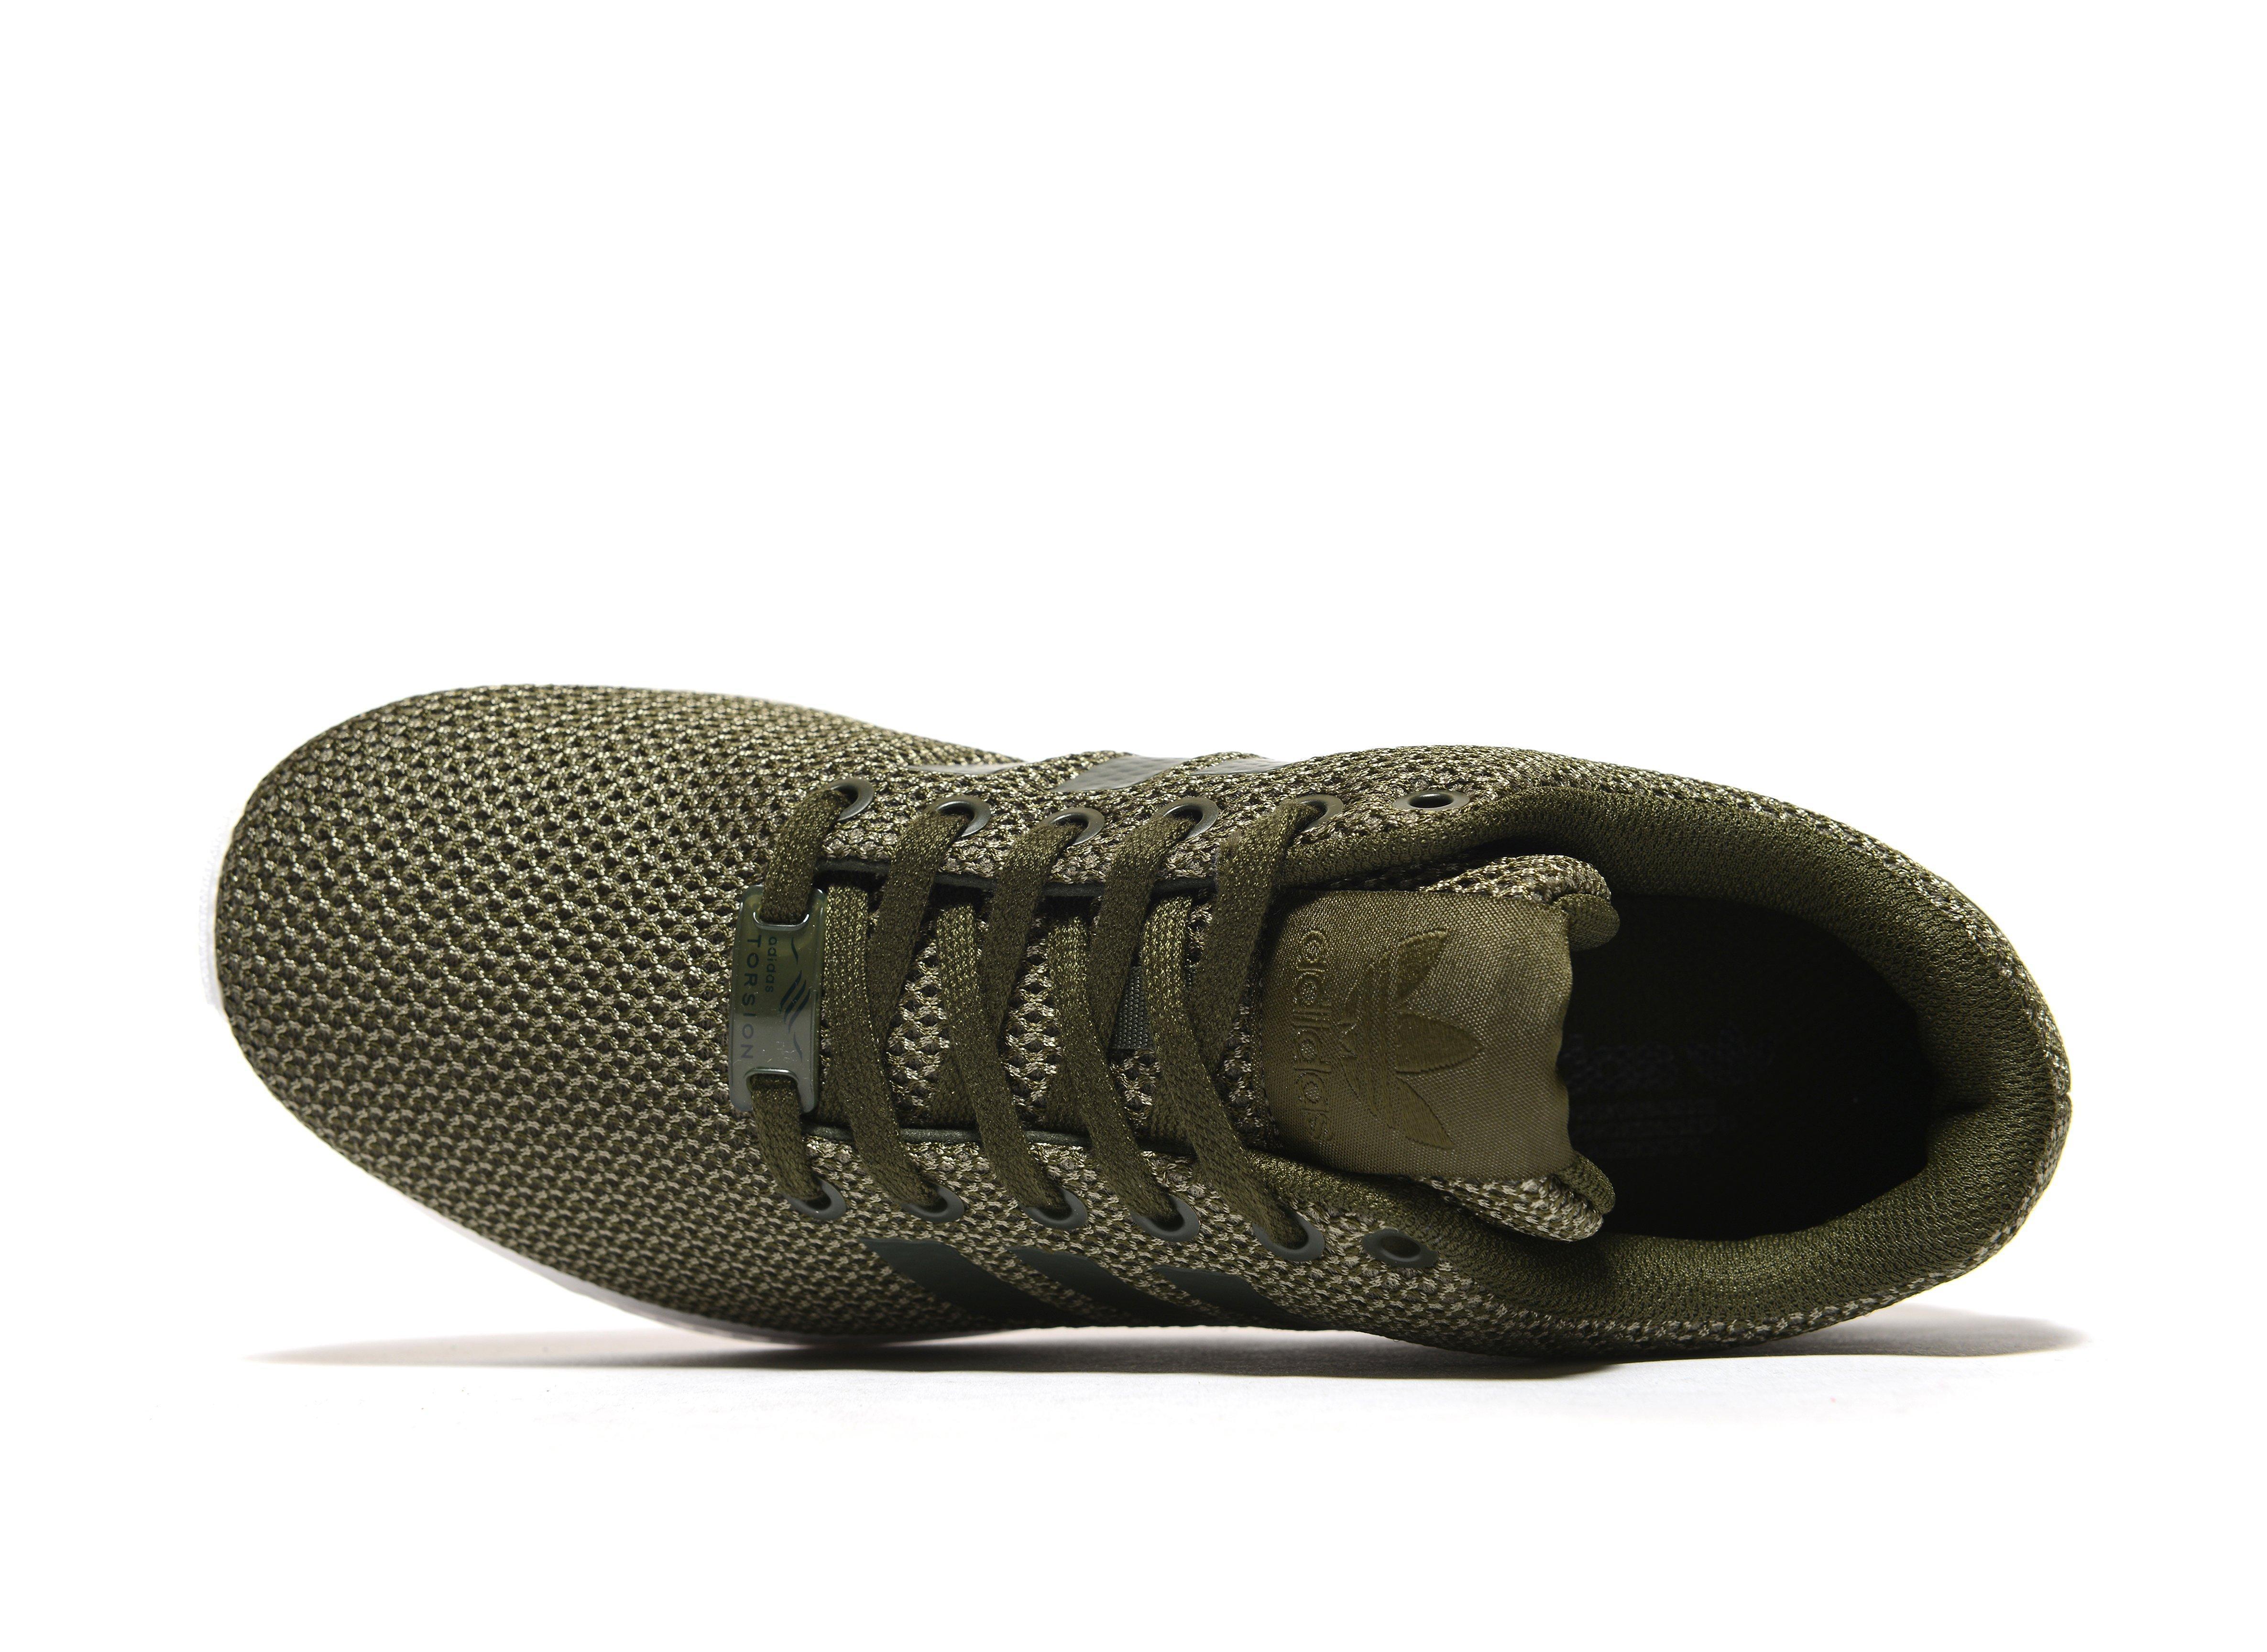 adidas Originals Synthetic Zx Flux in